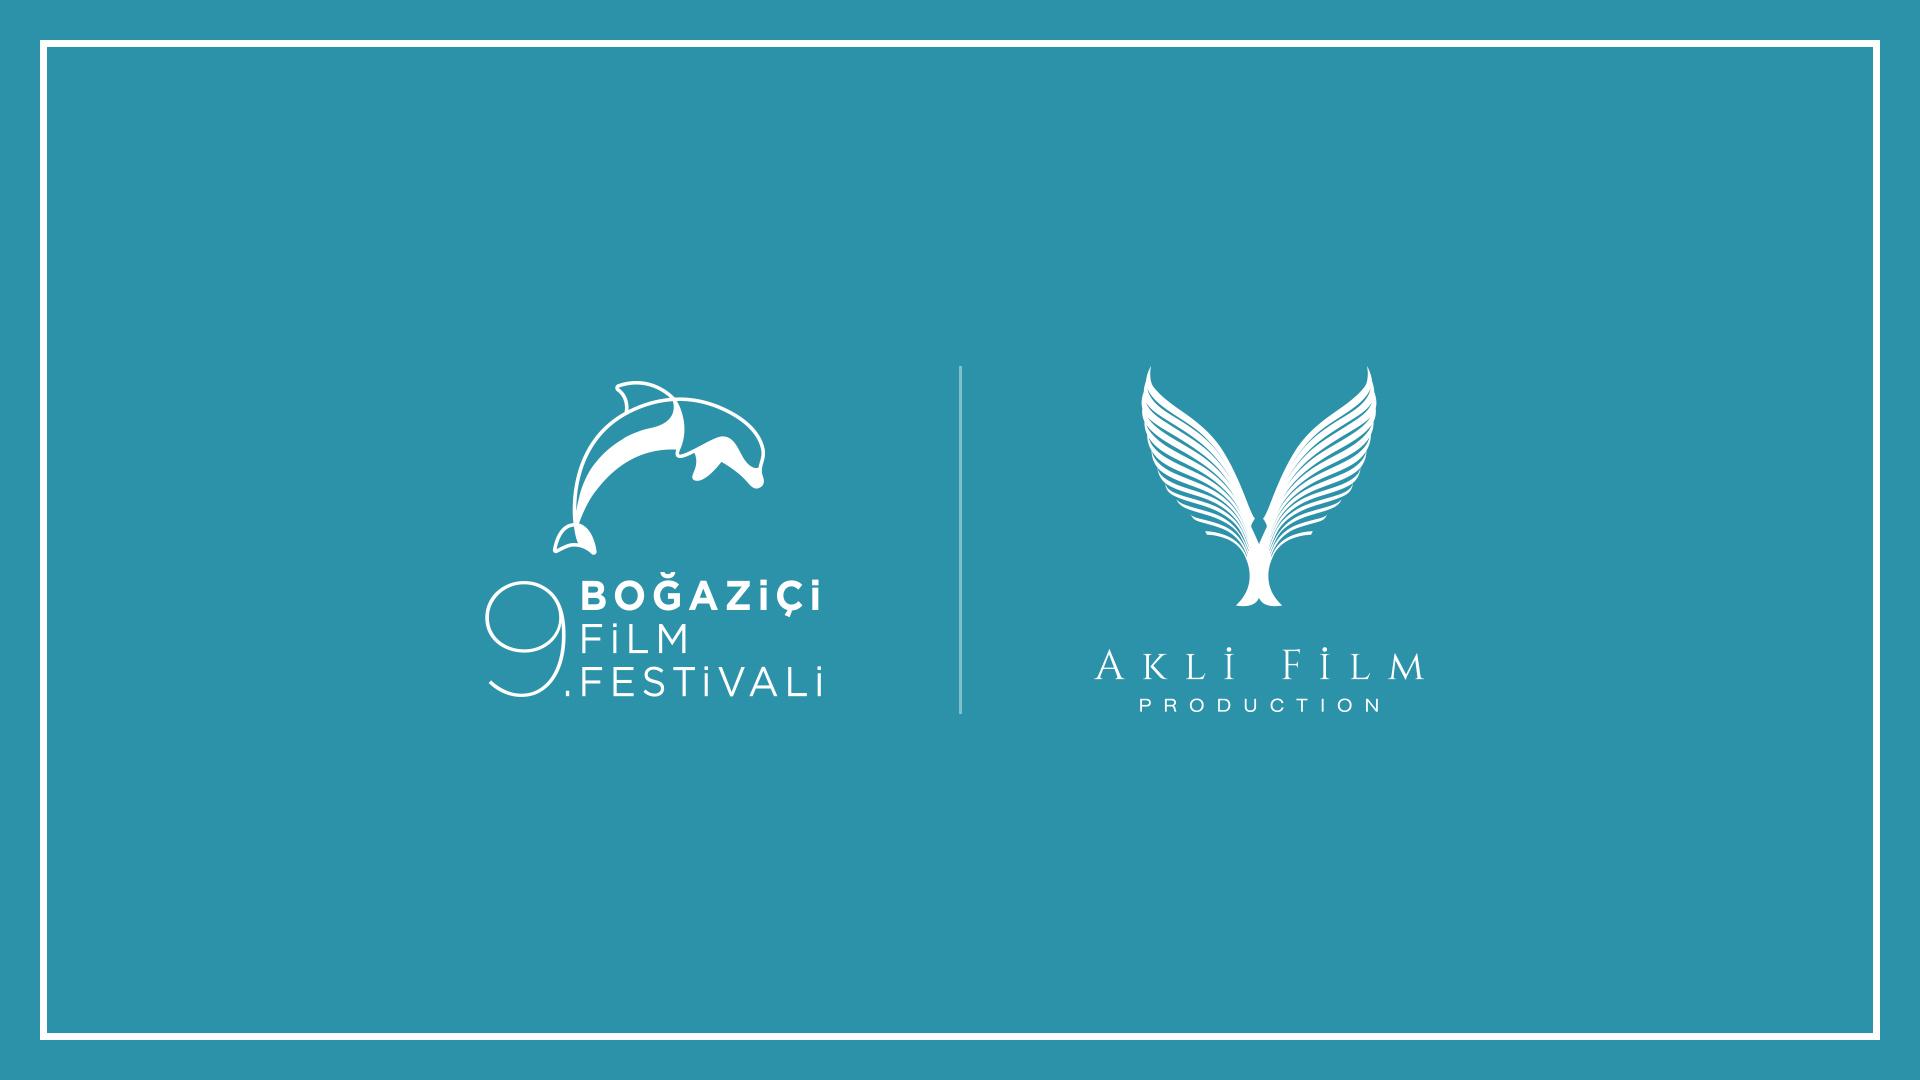 Boğaziçi Film Festivali (c).jpeg